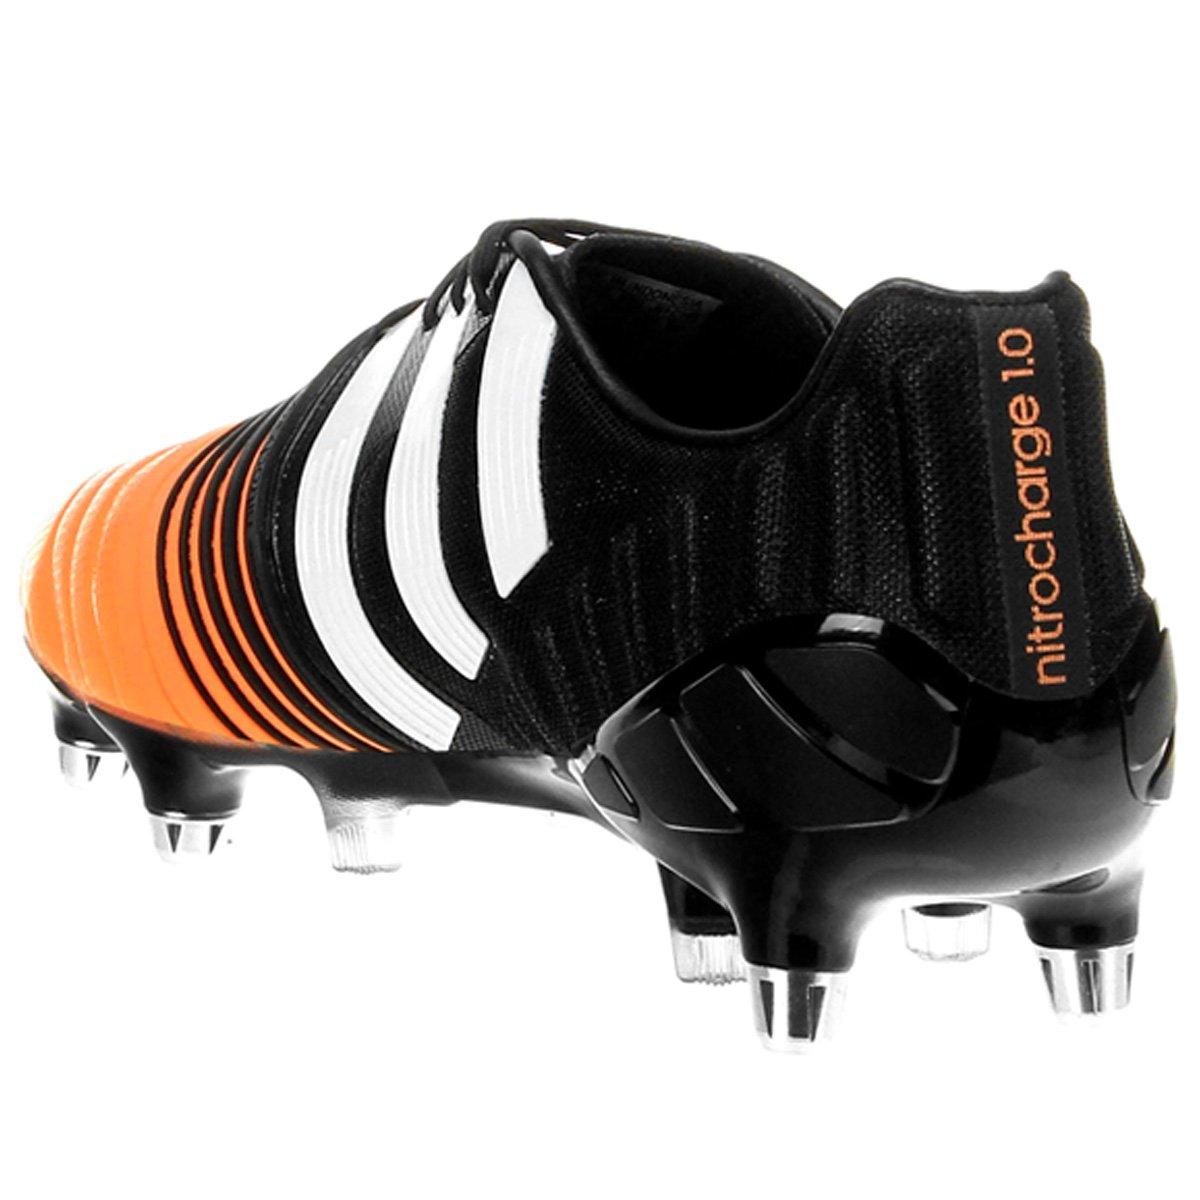 premium selection 2b1c4 f83a8 ... sweden botines adidas f5 trx fg netshoes chuteira adidas nitrocharge  1.0 sg campo preto e laranja